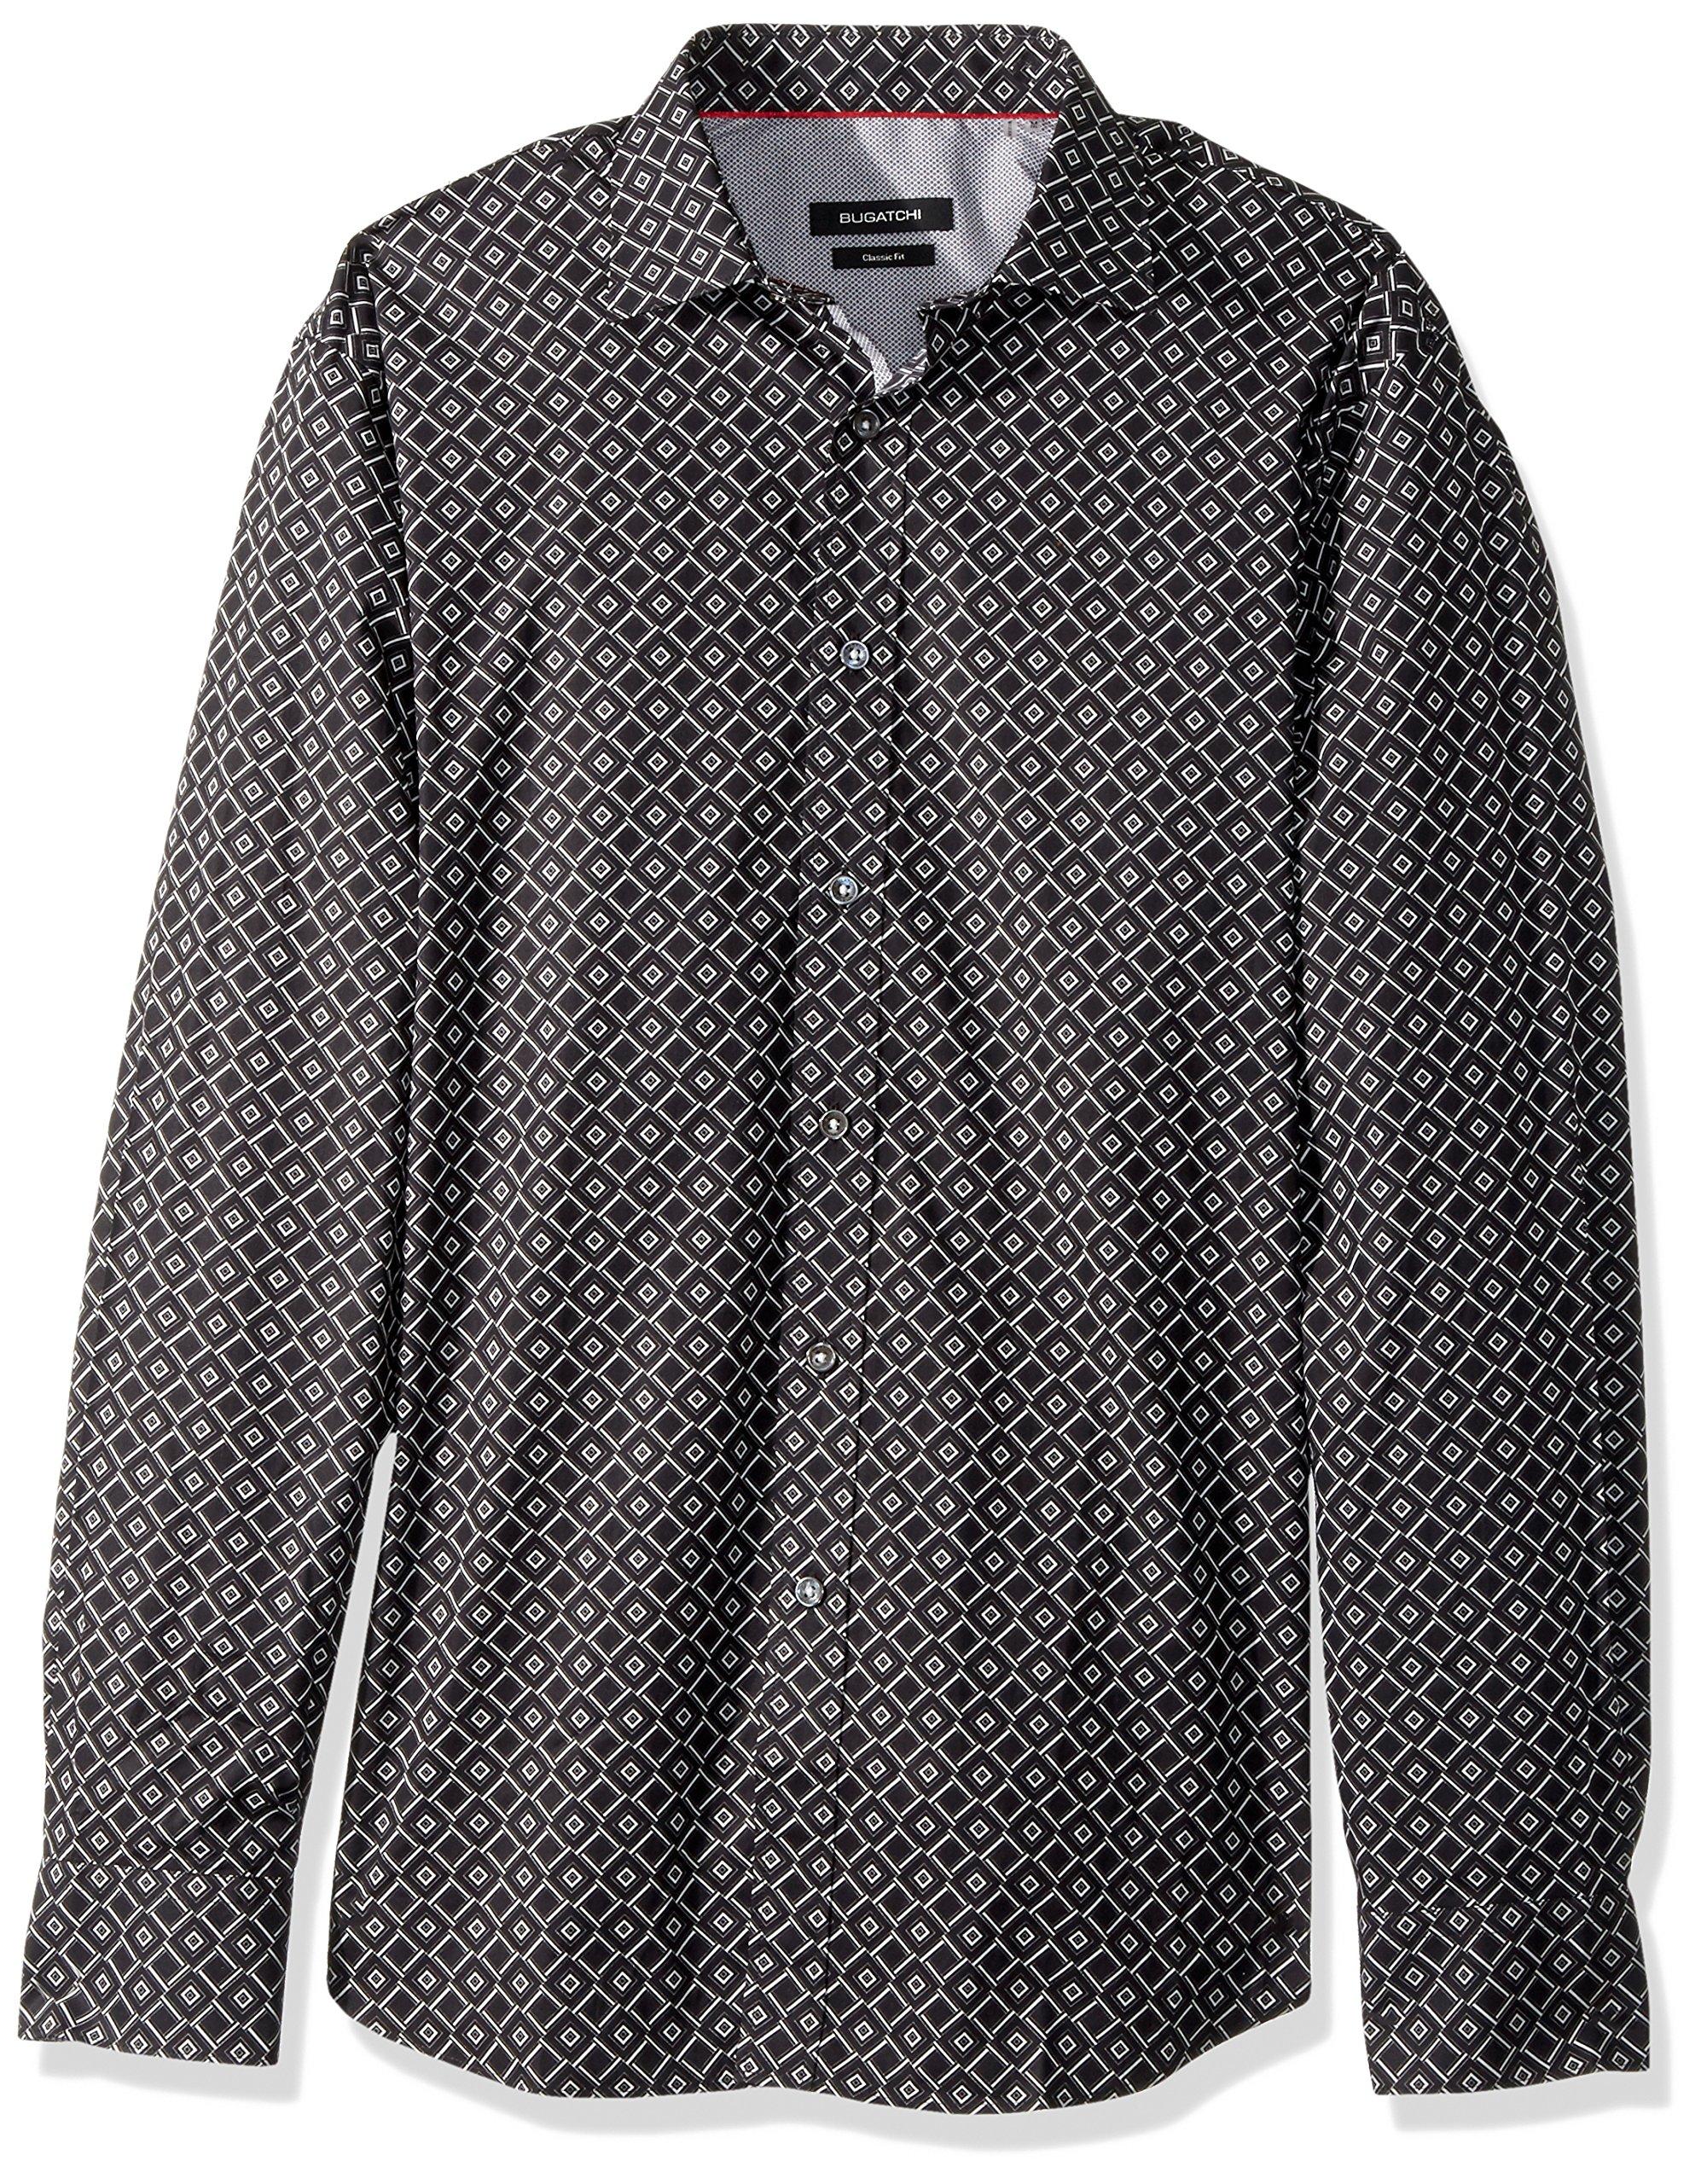 BUGATCHI Men's Cotton Long Sleeve Classic Fit Dali Woven, Black, XL